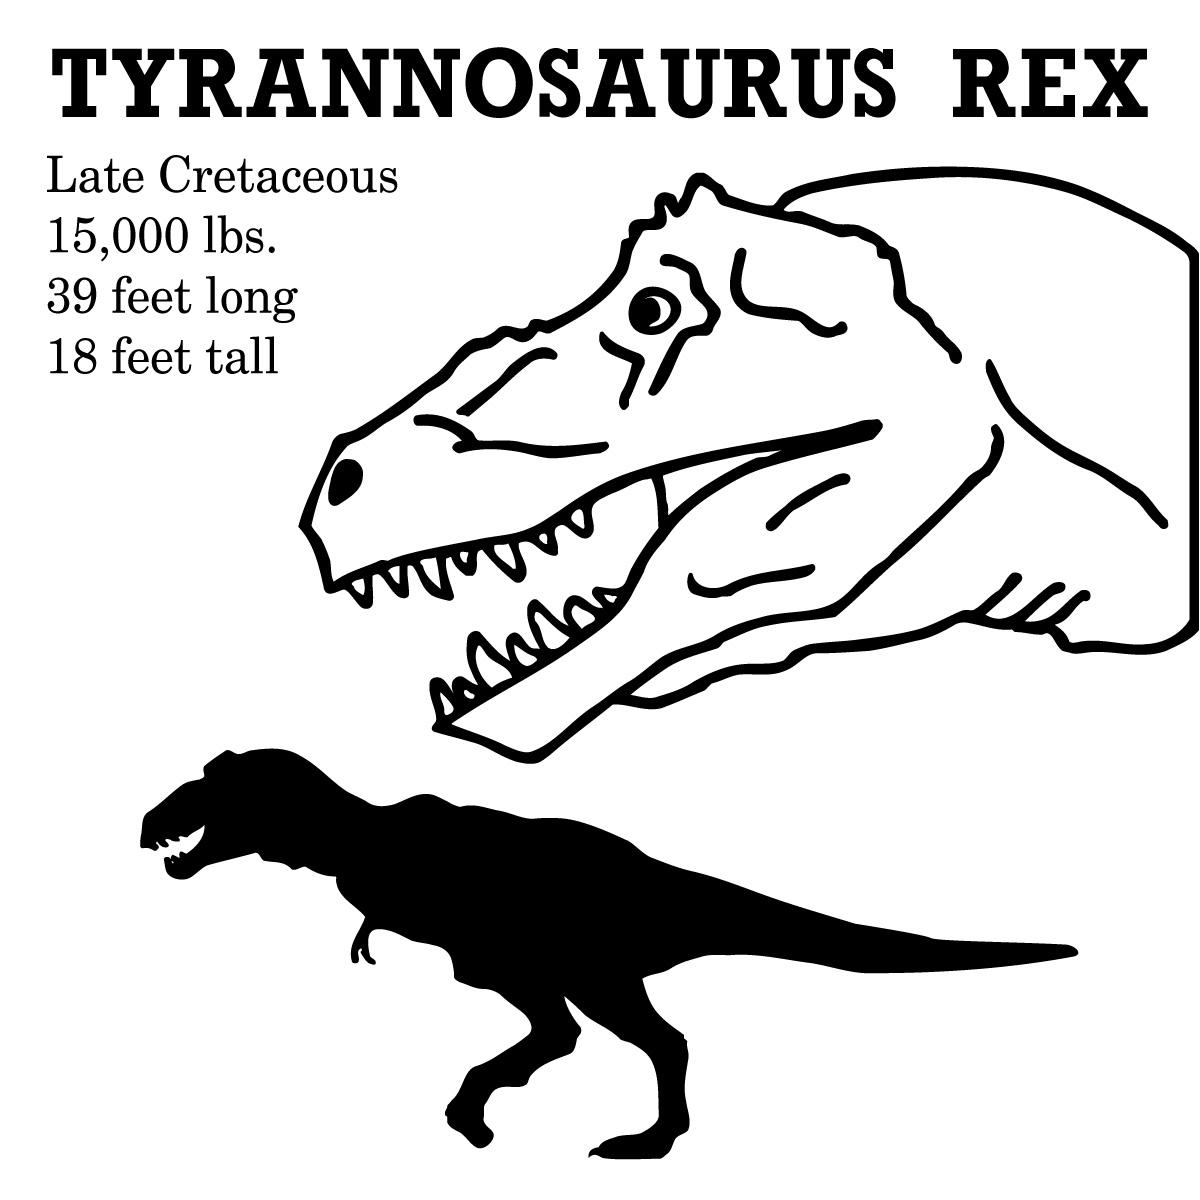 1200x1200 Tyrannosaurus Rex Clipart Dinosaur Outline